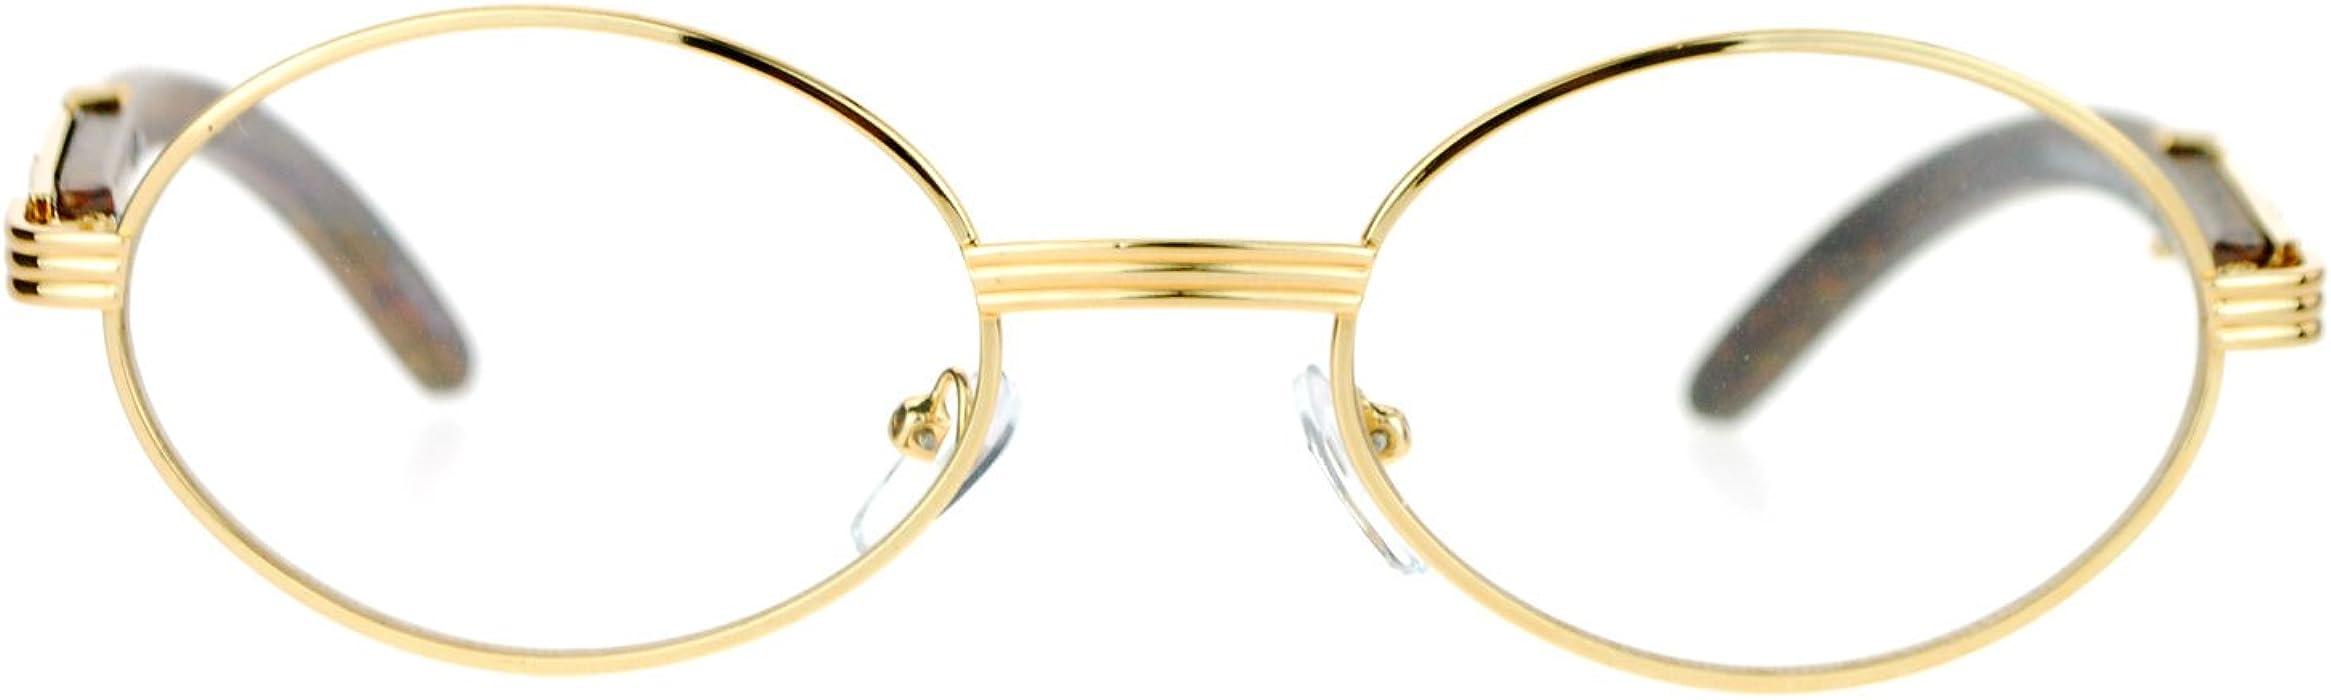 0c4c206245 Vintage Wood Buffs Fashion Eyeglasses Oval Frame Clear Lens Glasses UV400